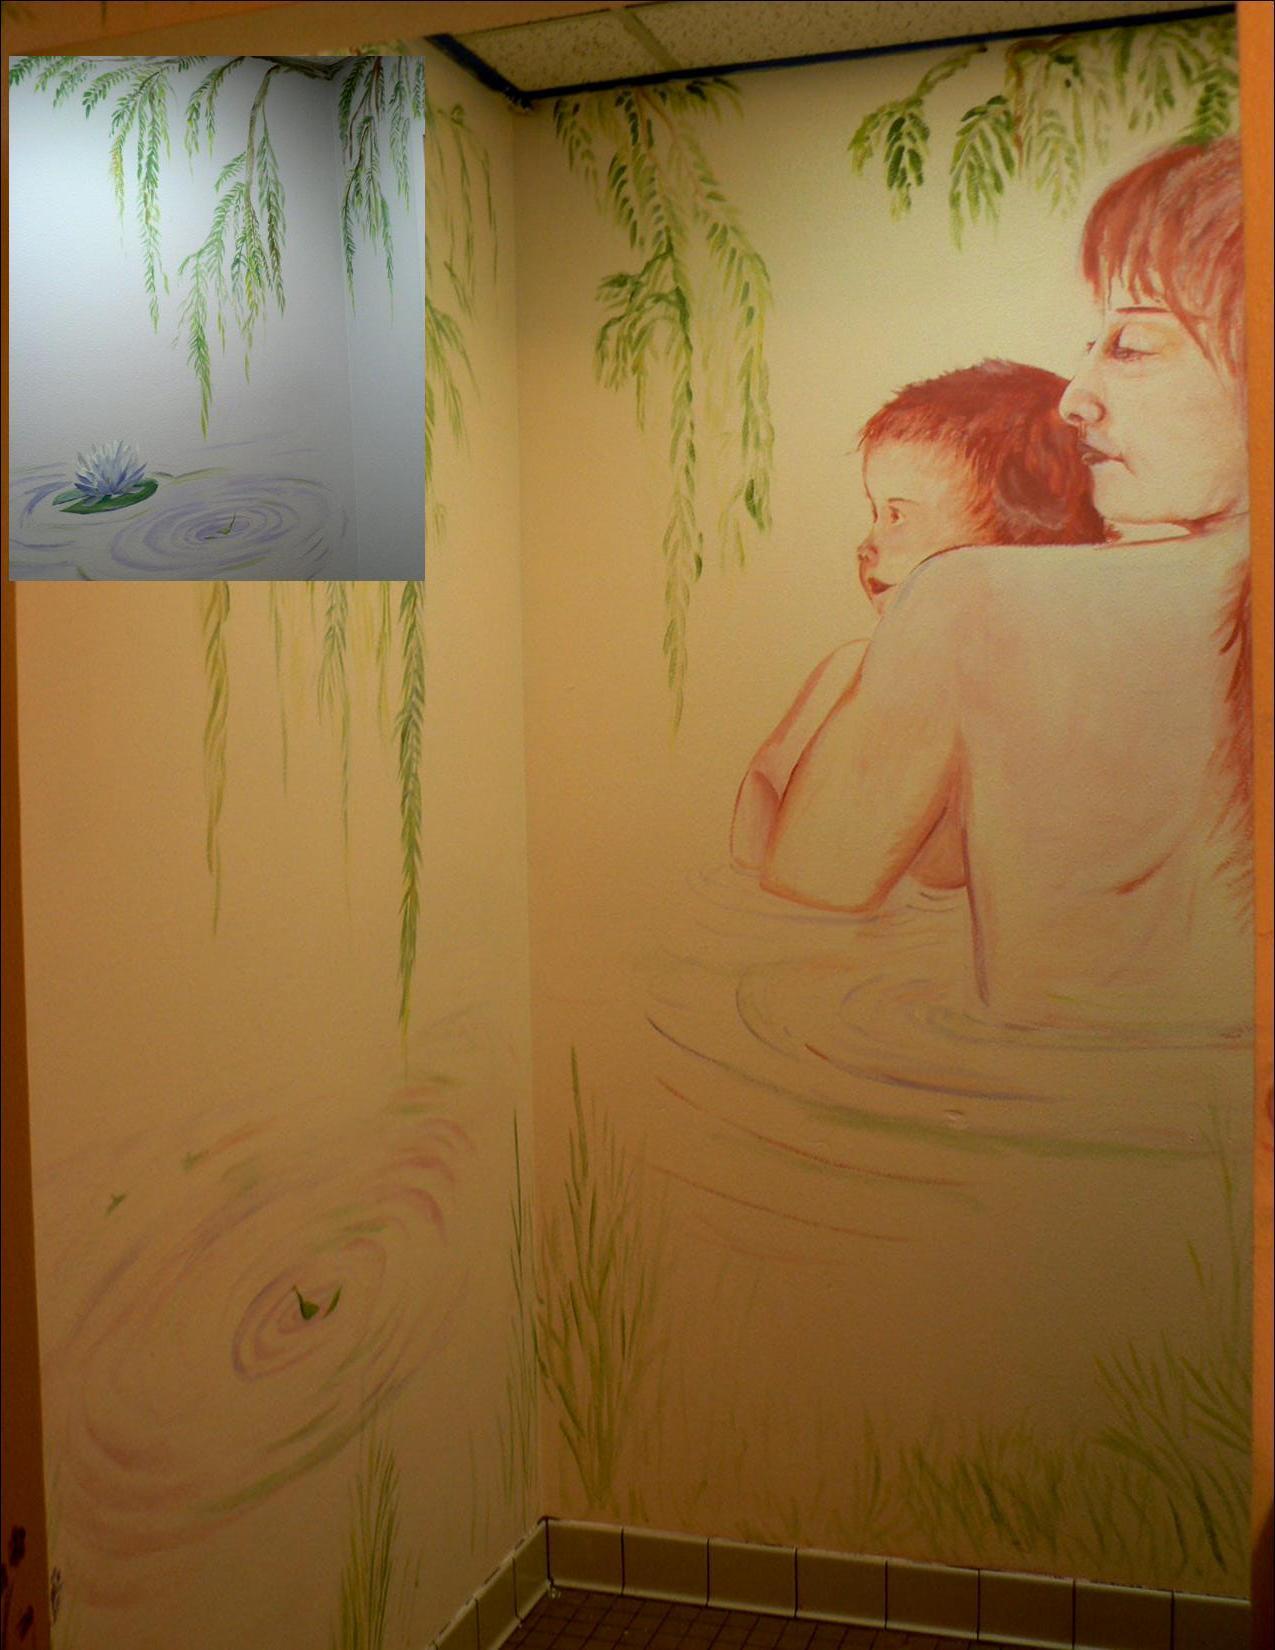 St. James Bathroom